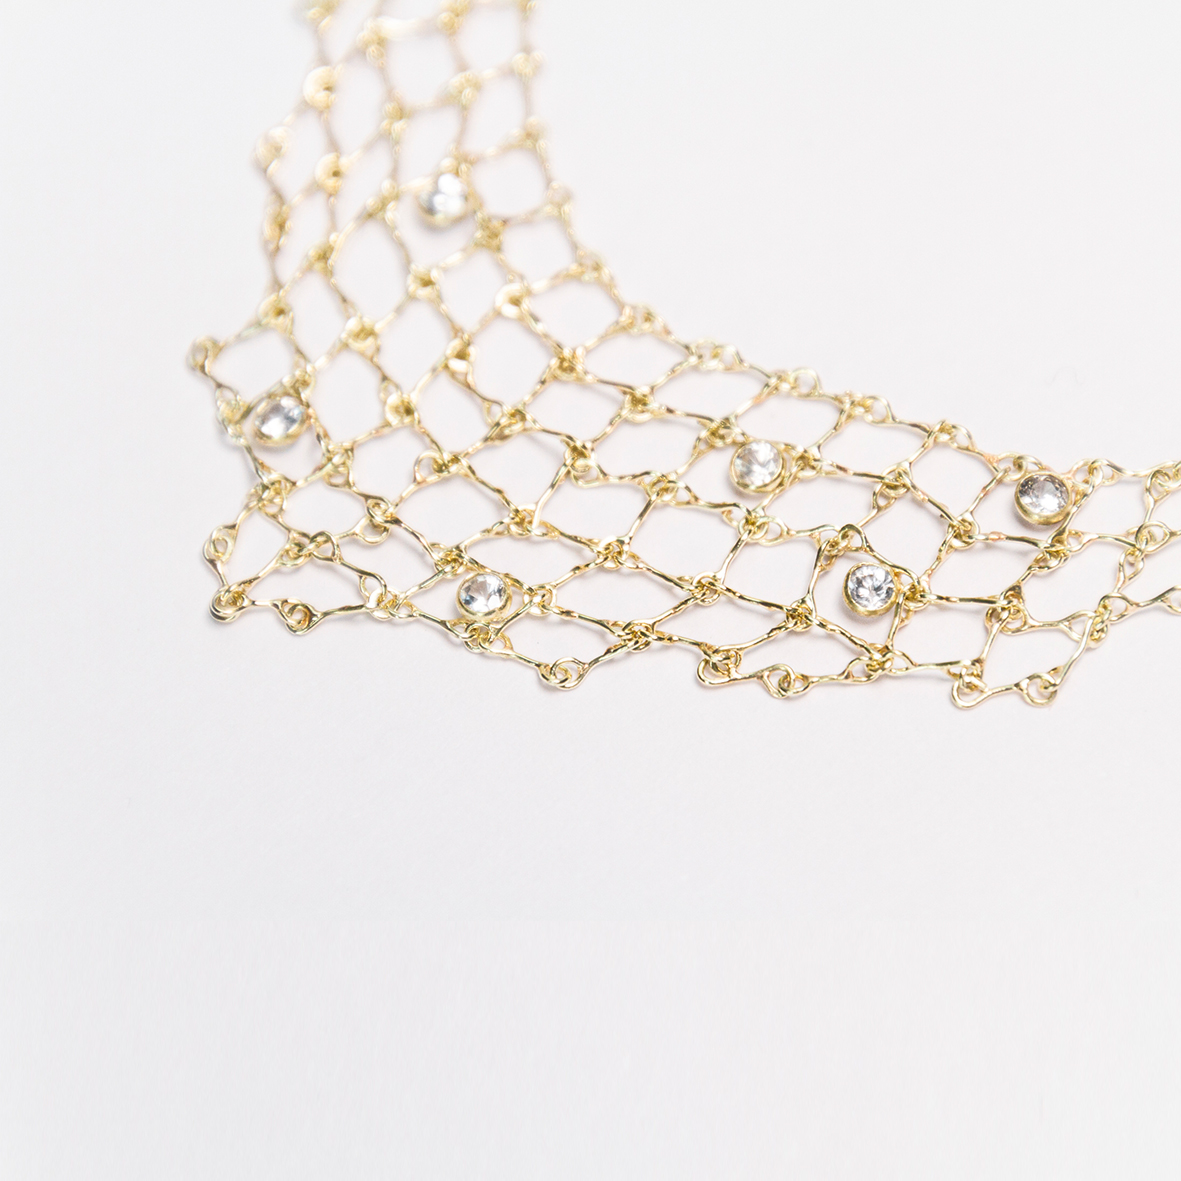 1. OONA_philo_ficha2_sapphire triangle net necklace